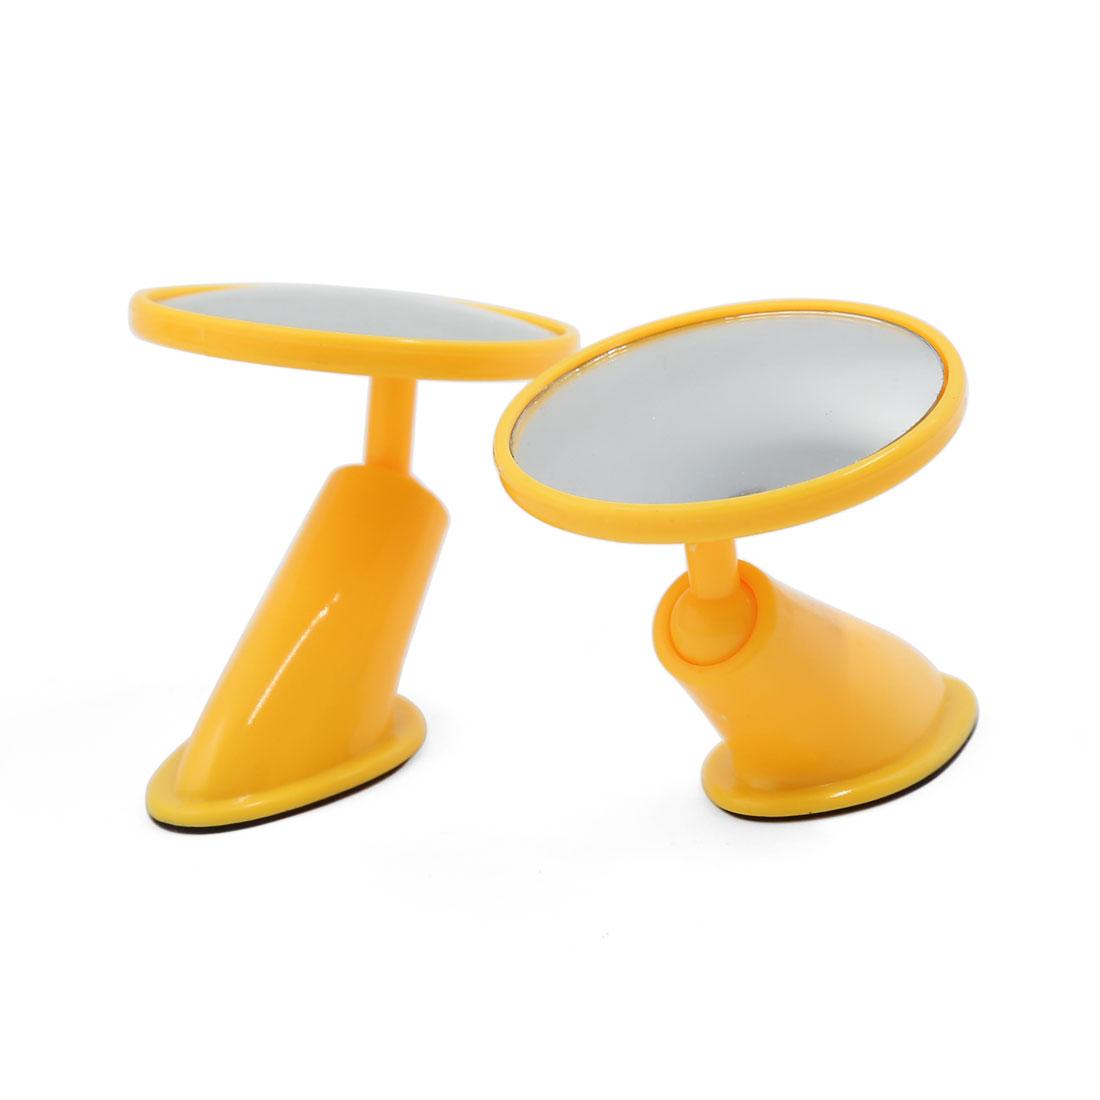 Universal Car Yellow Frame Adhesive Convex Blind Spot Rear View Mirror 2 Pcs